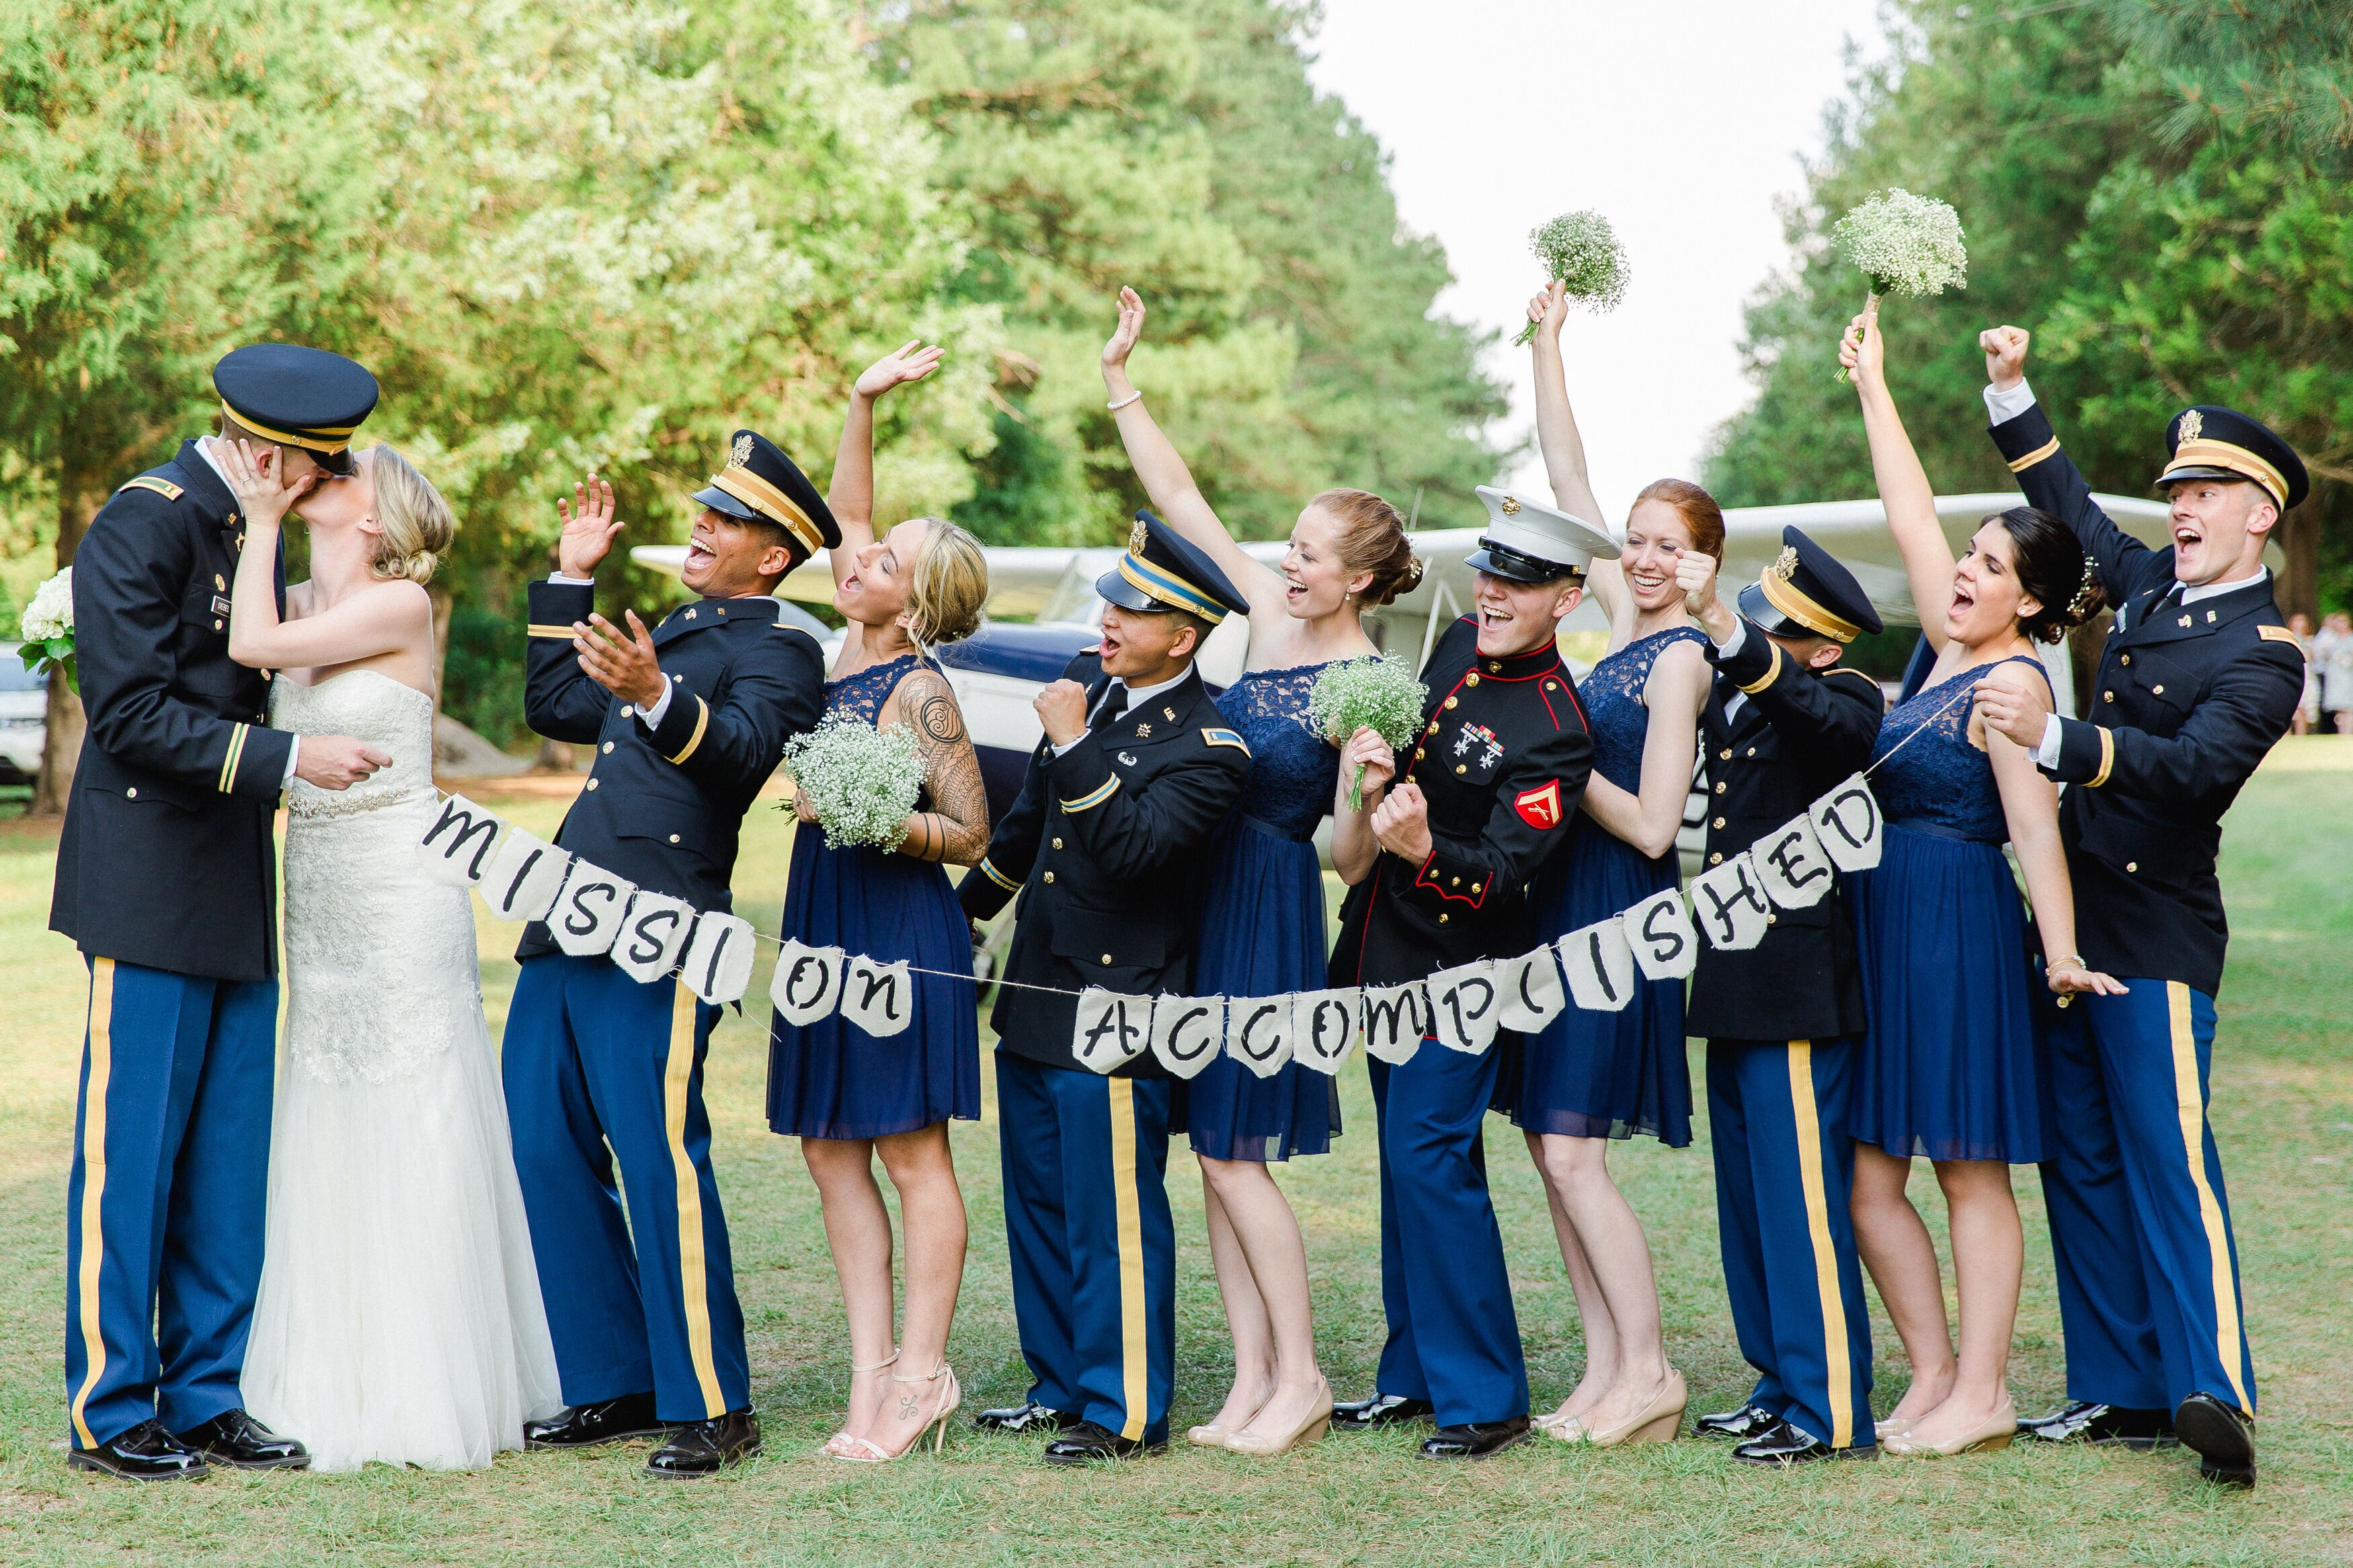 Groomsmen Us Military Dress Blues Military Dresses Military Dress Blue Blue Dresses [ 2333 x 3500 Pixel ]